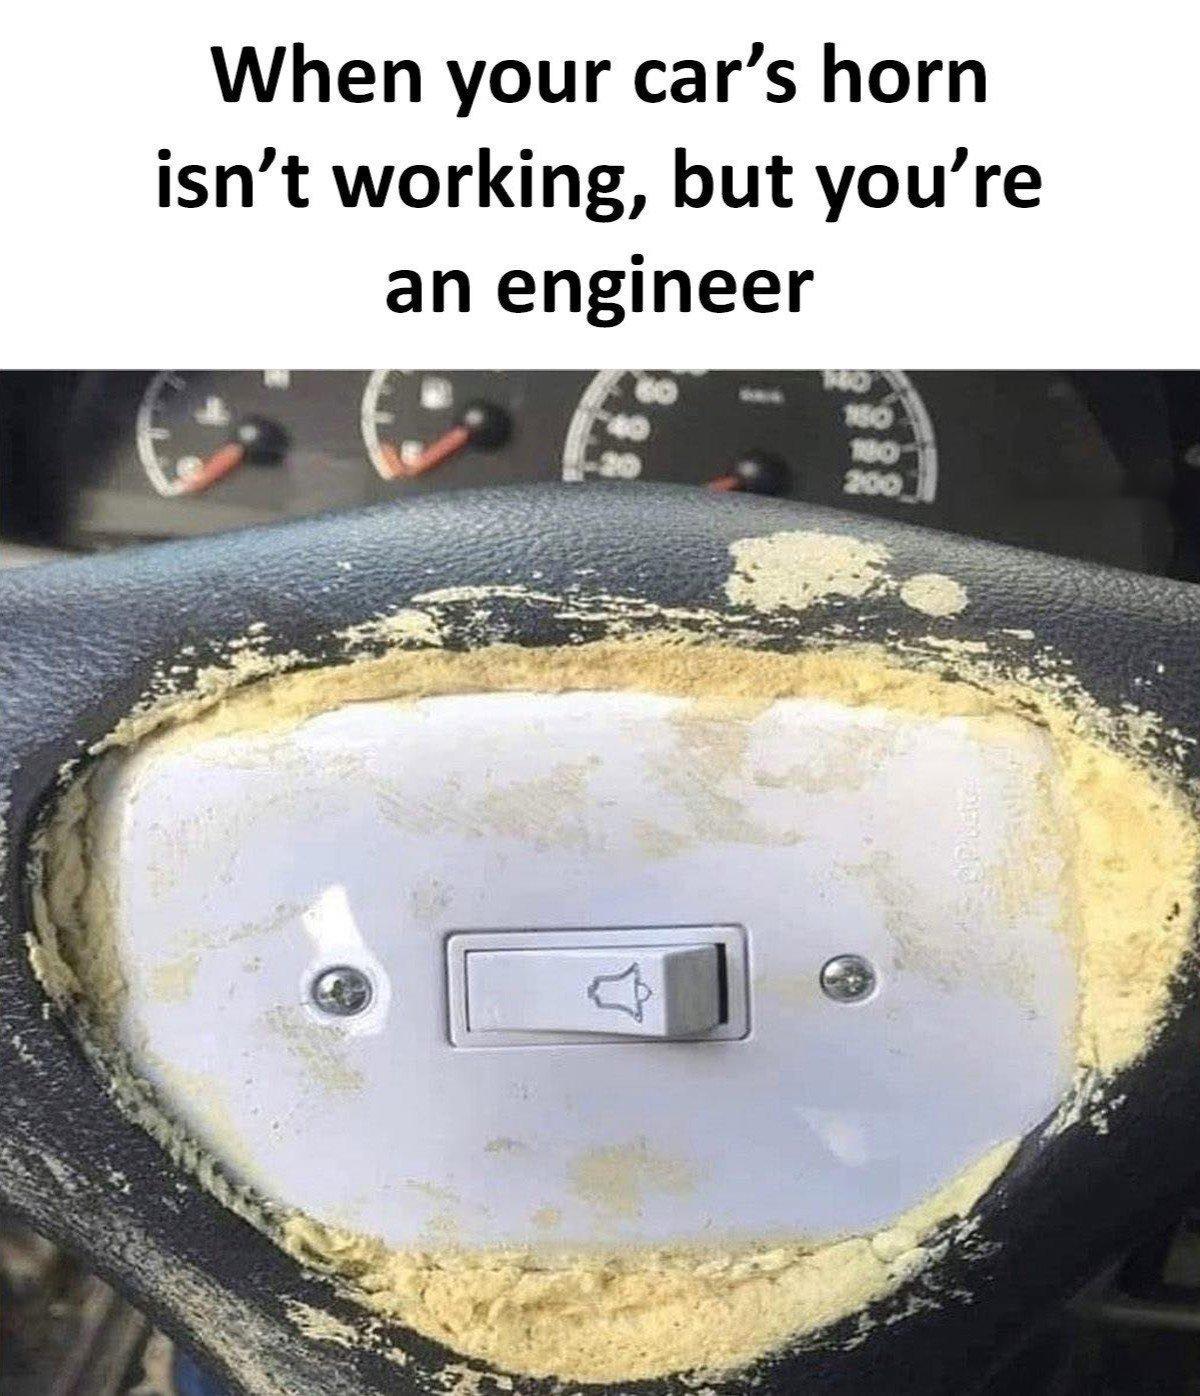 When You Car's...